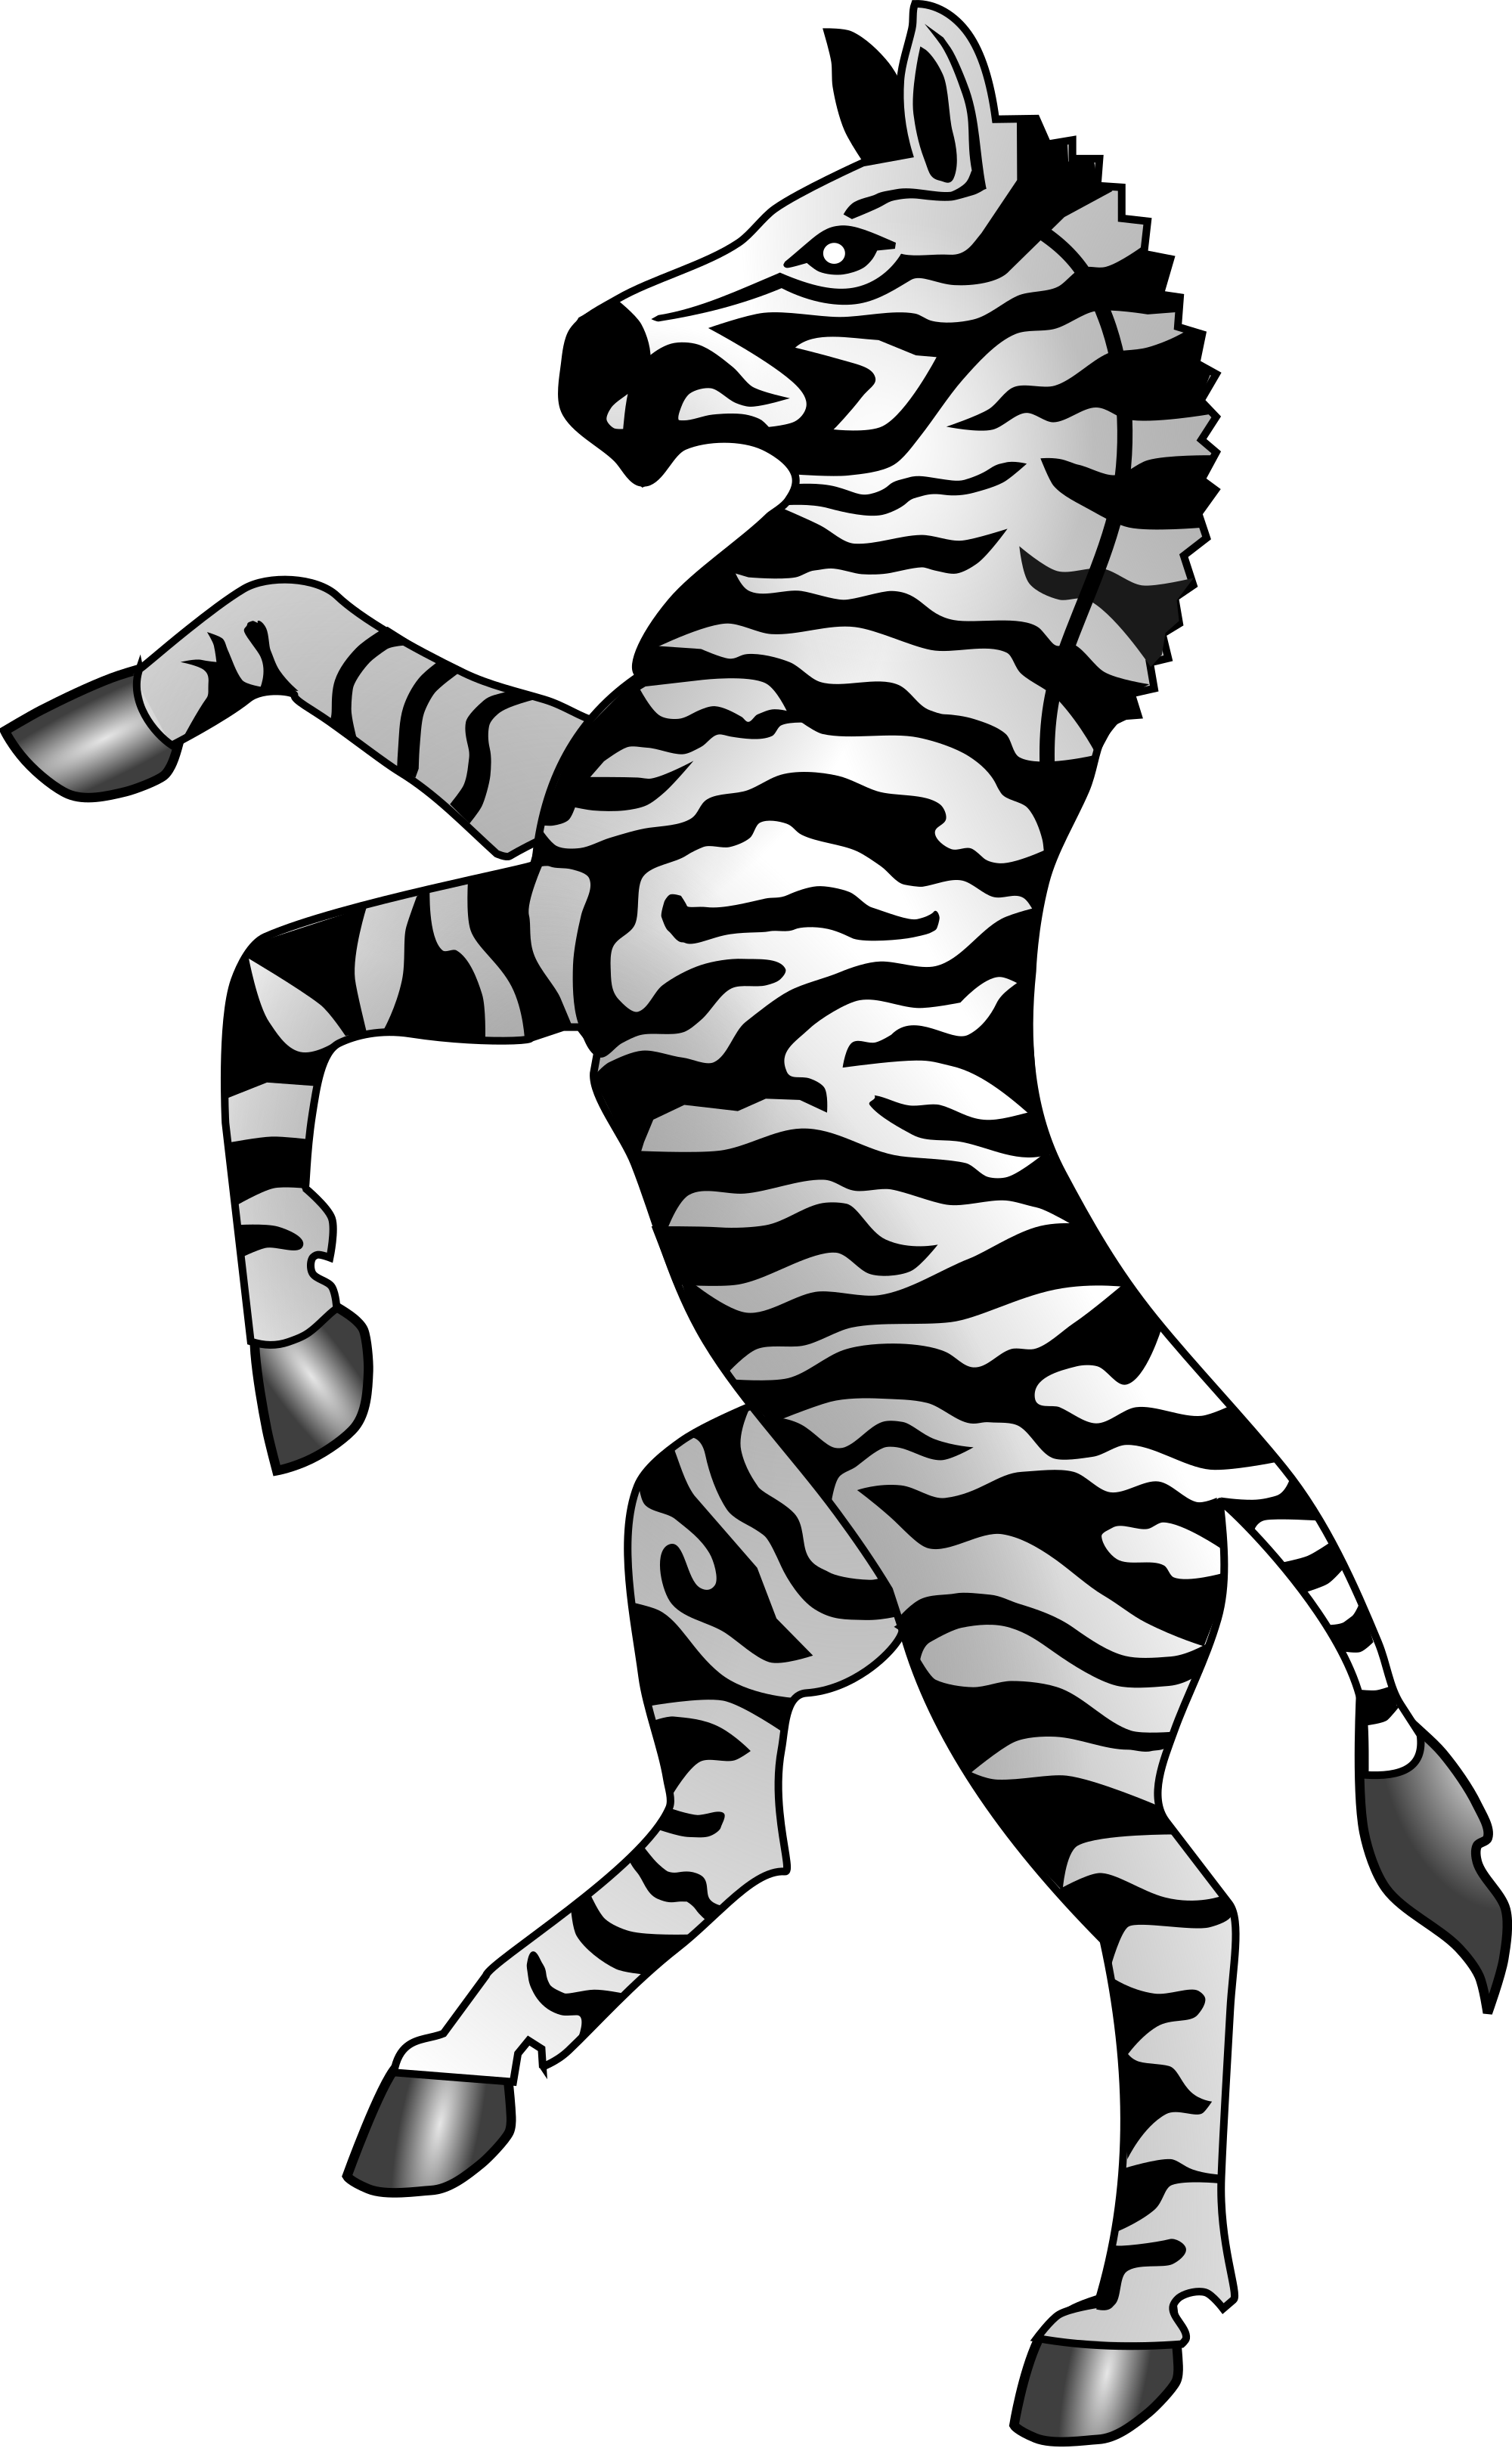 Clipart zebra front. File heraldry svg wikimedia